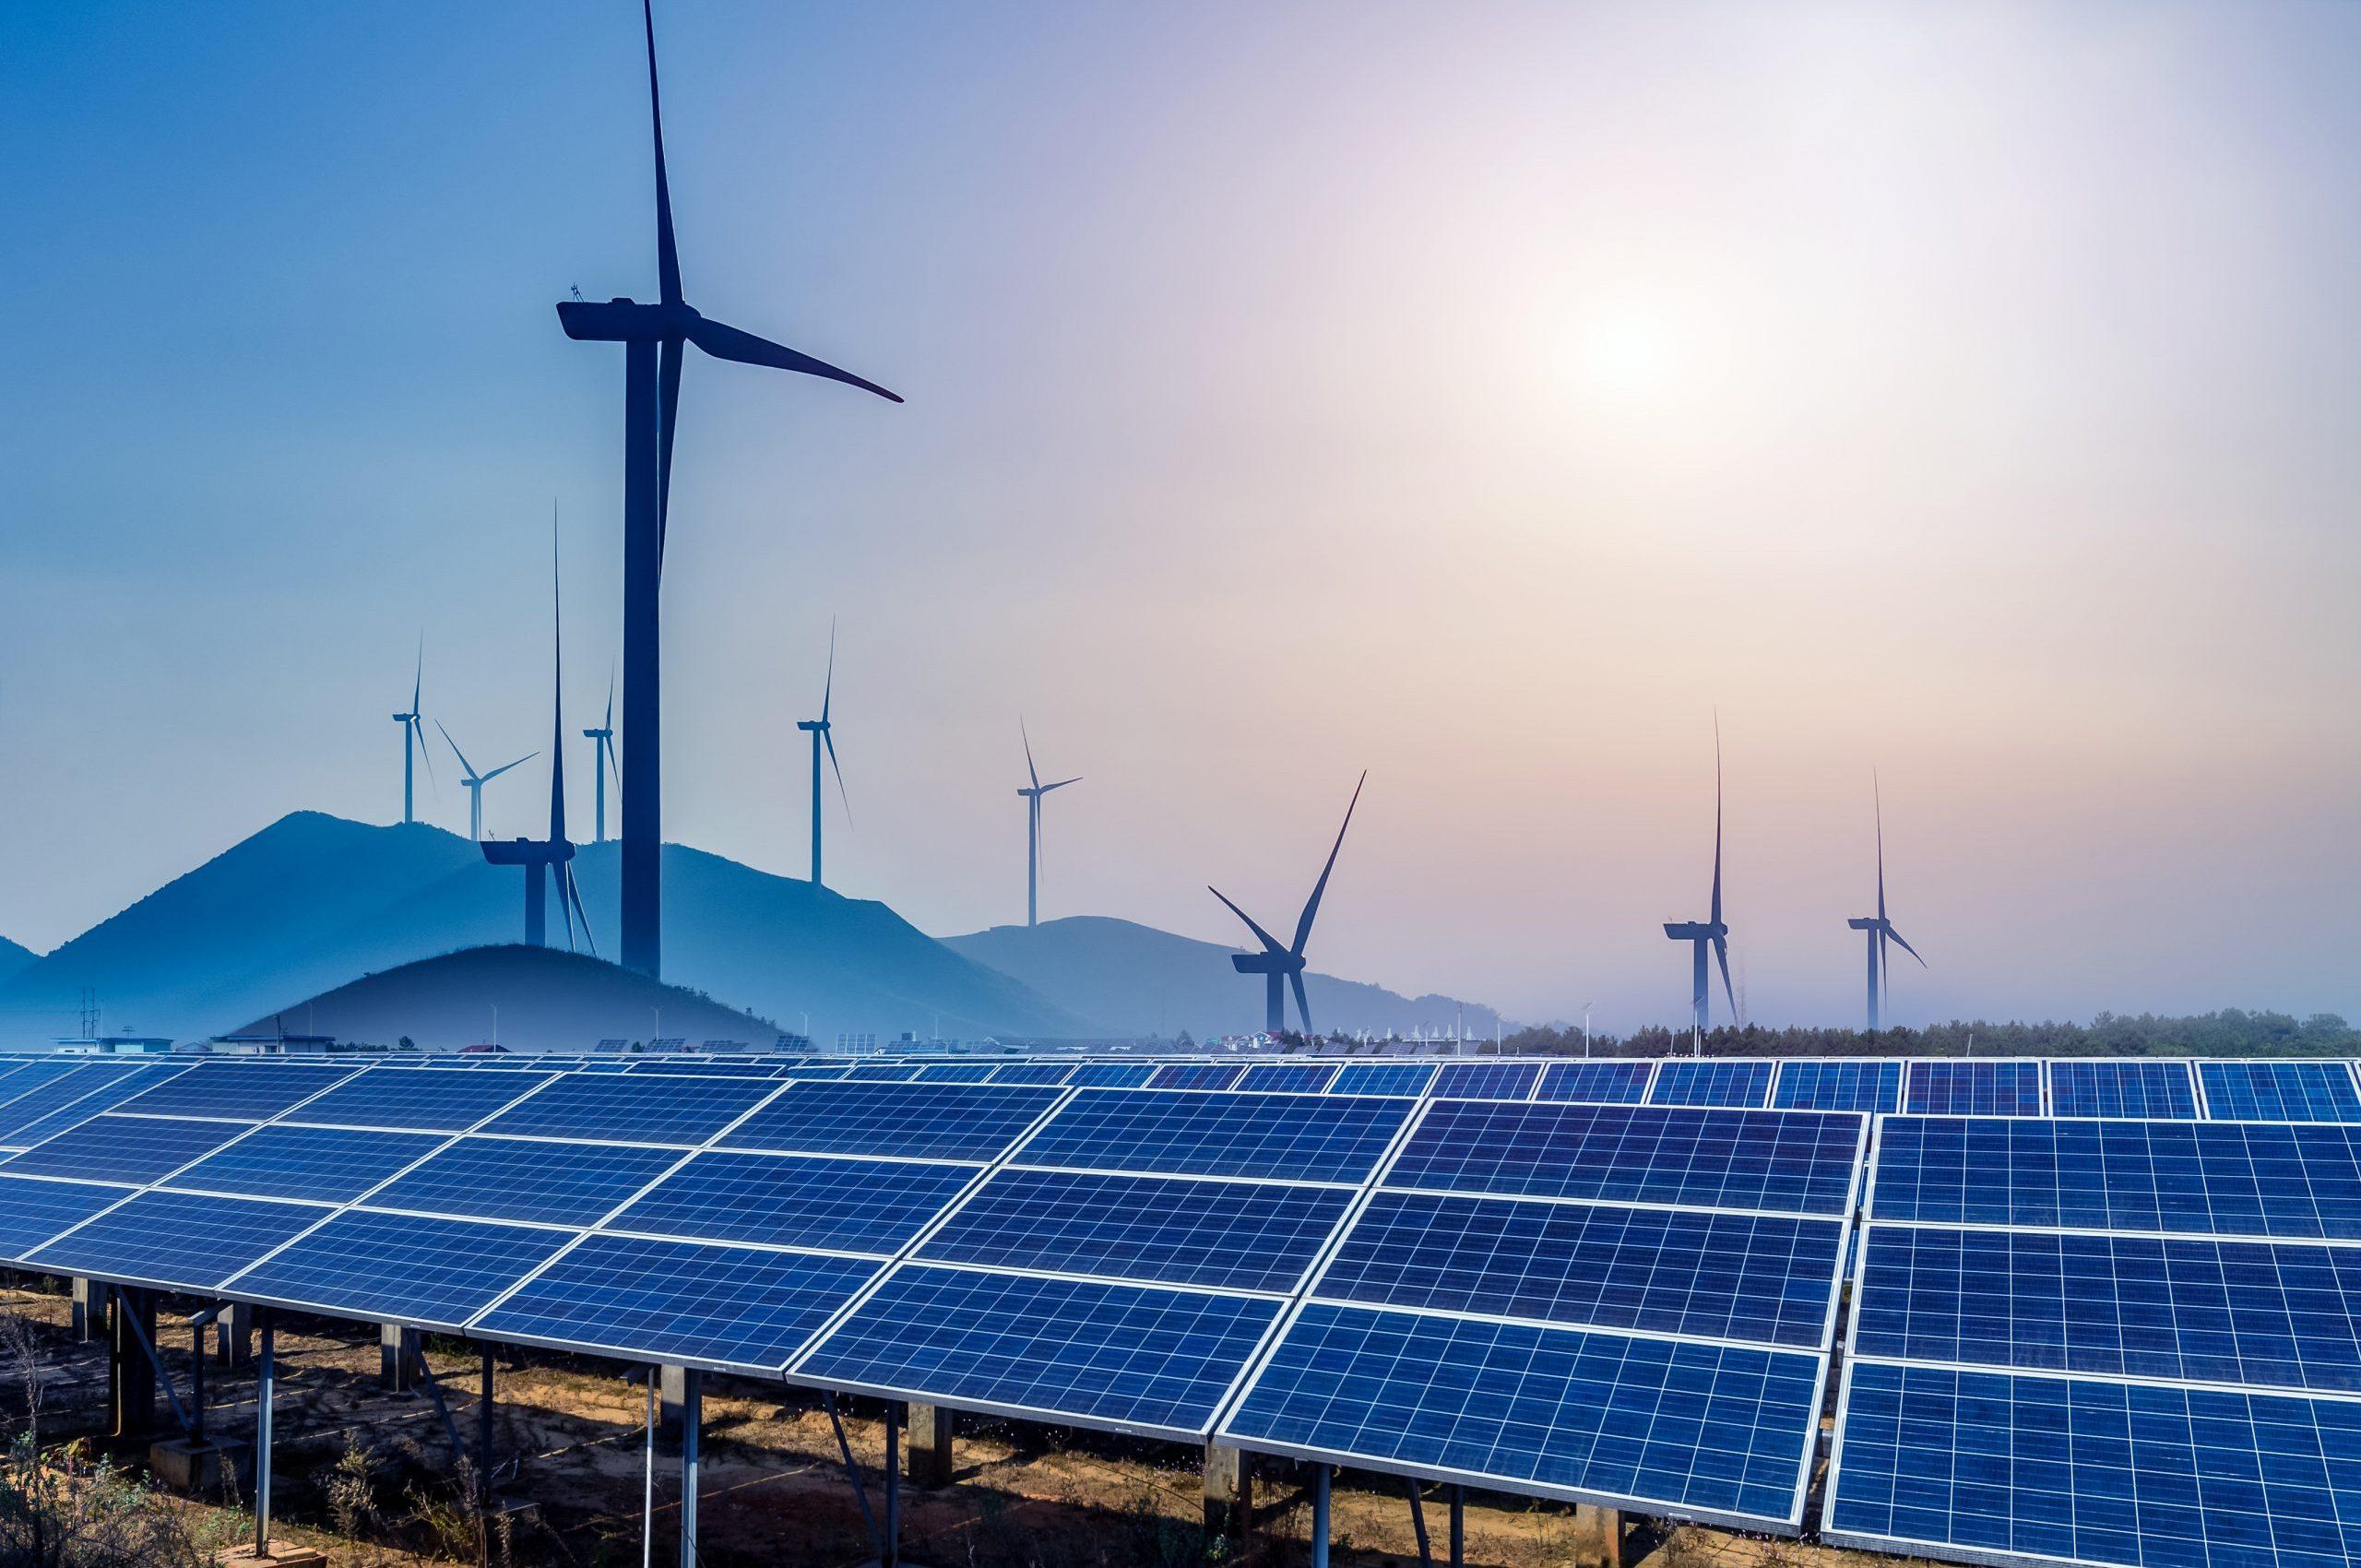 rmda-ss-energy-industry-windmills-solar-panels.2560.1703